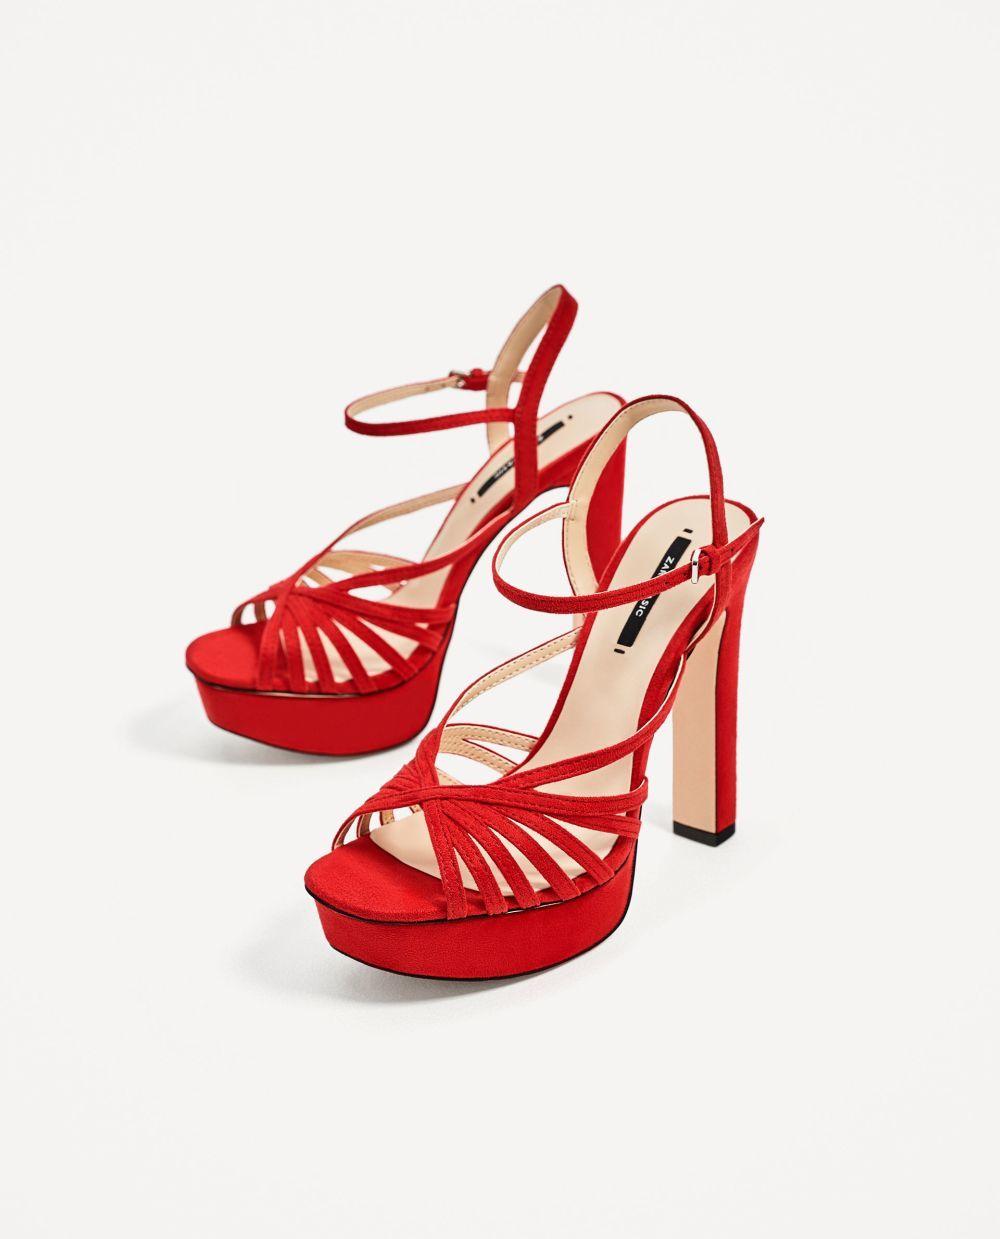 Sandalias de Zara (39.95 euros).